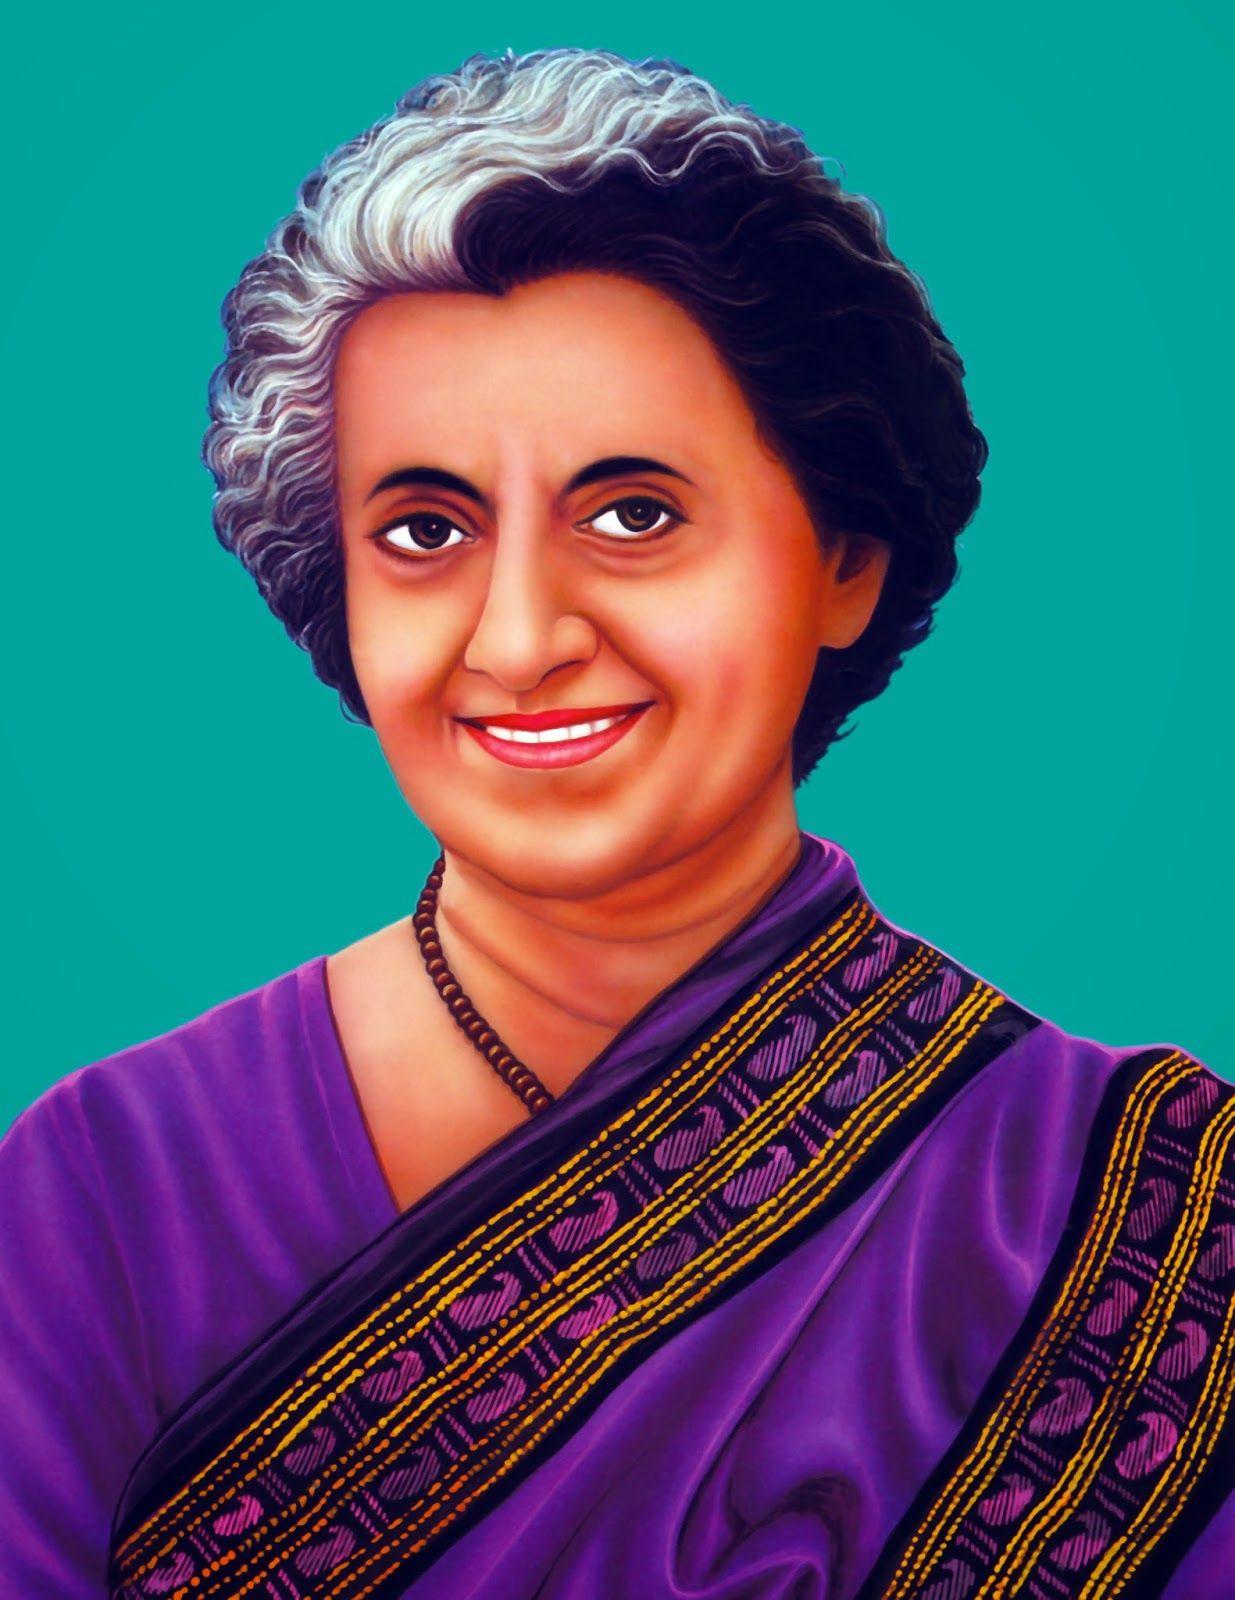 Indira Gandhi Hd Pictures